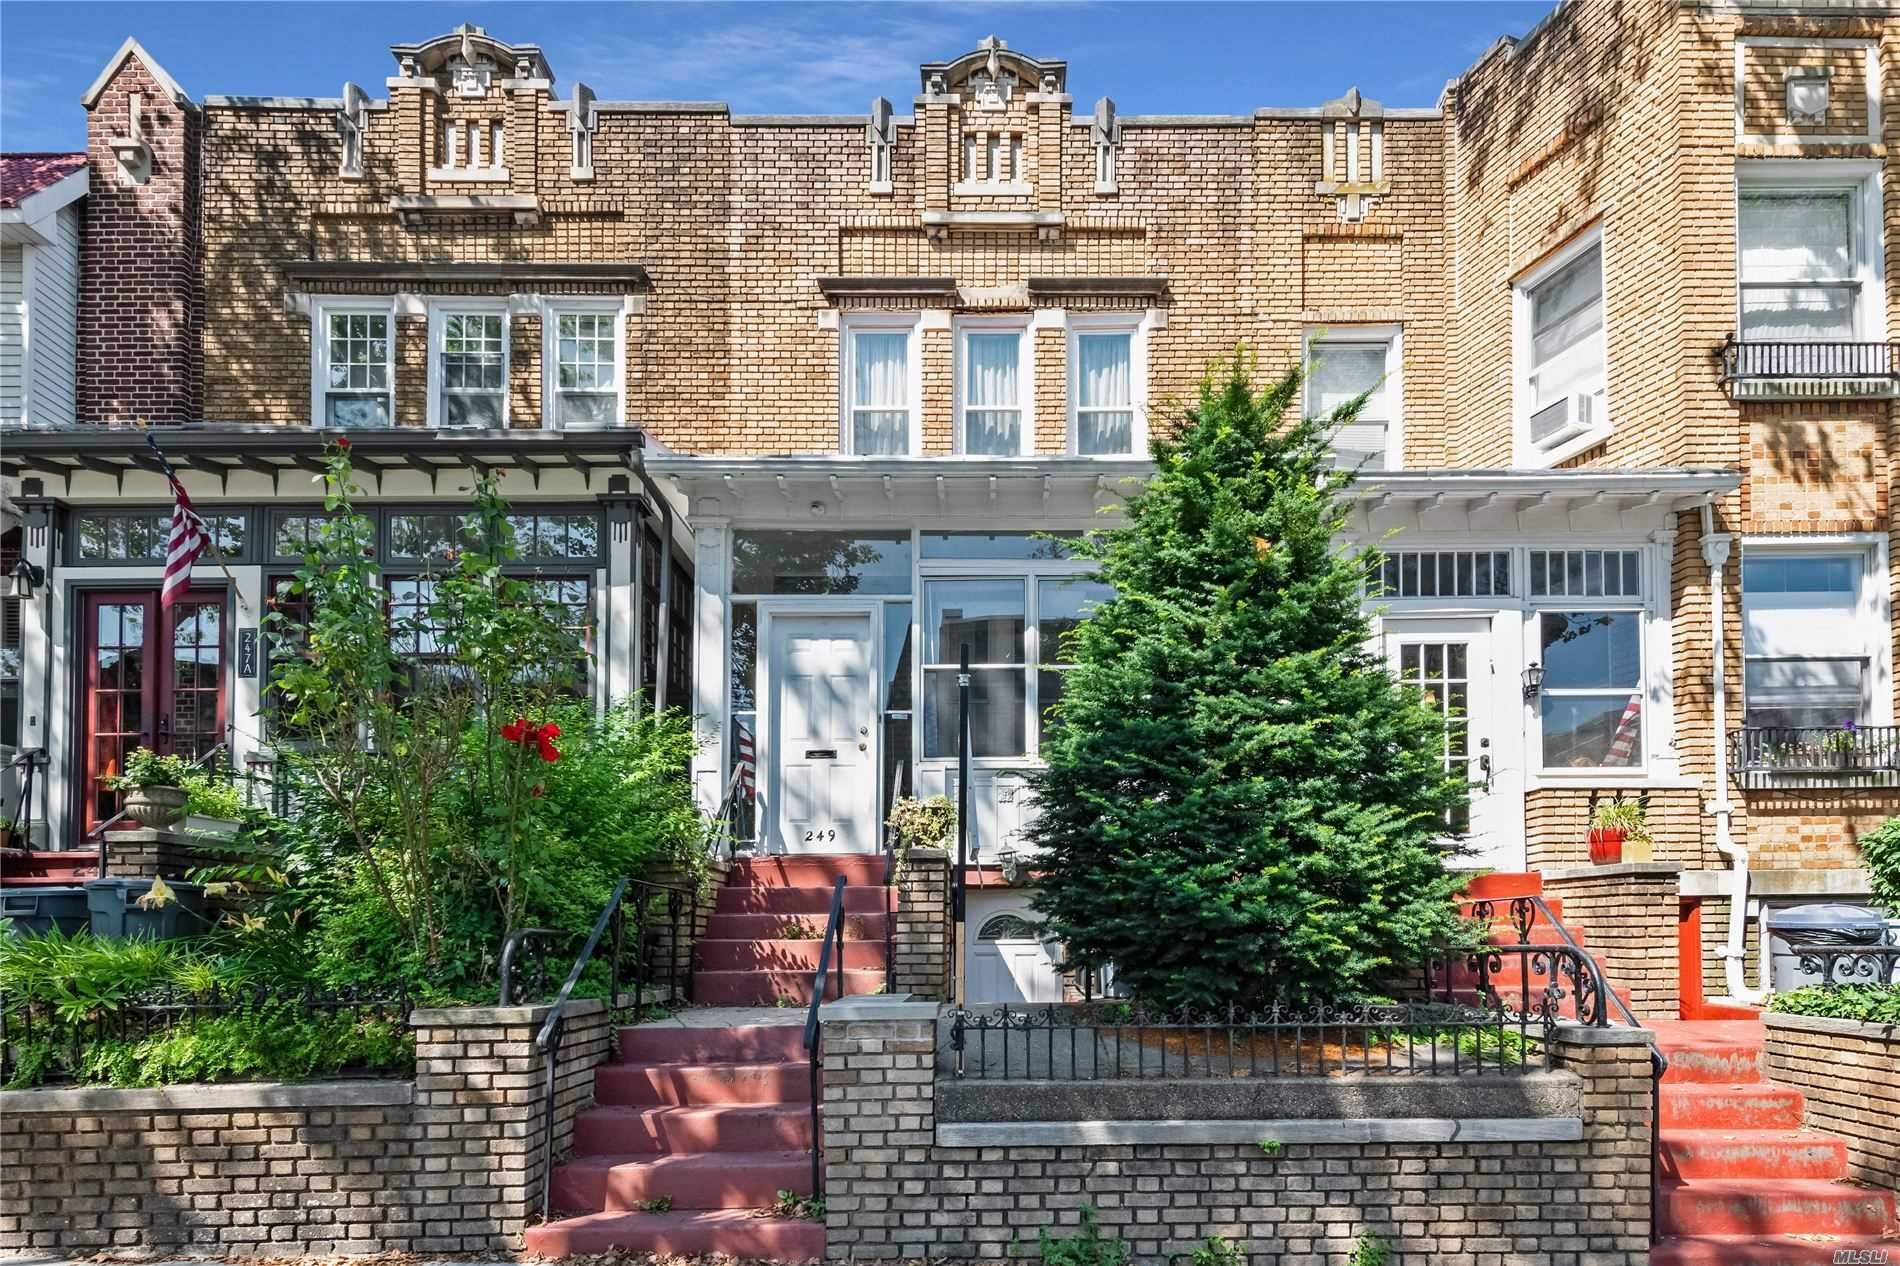 249 Windsor Place, Windsor Terrace, NY 11215 - MLS#: 3235363